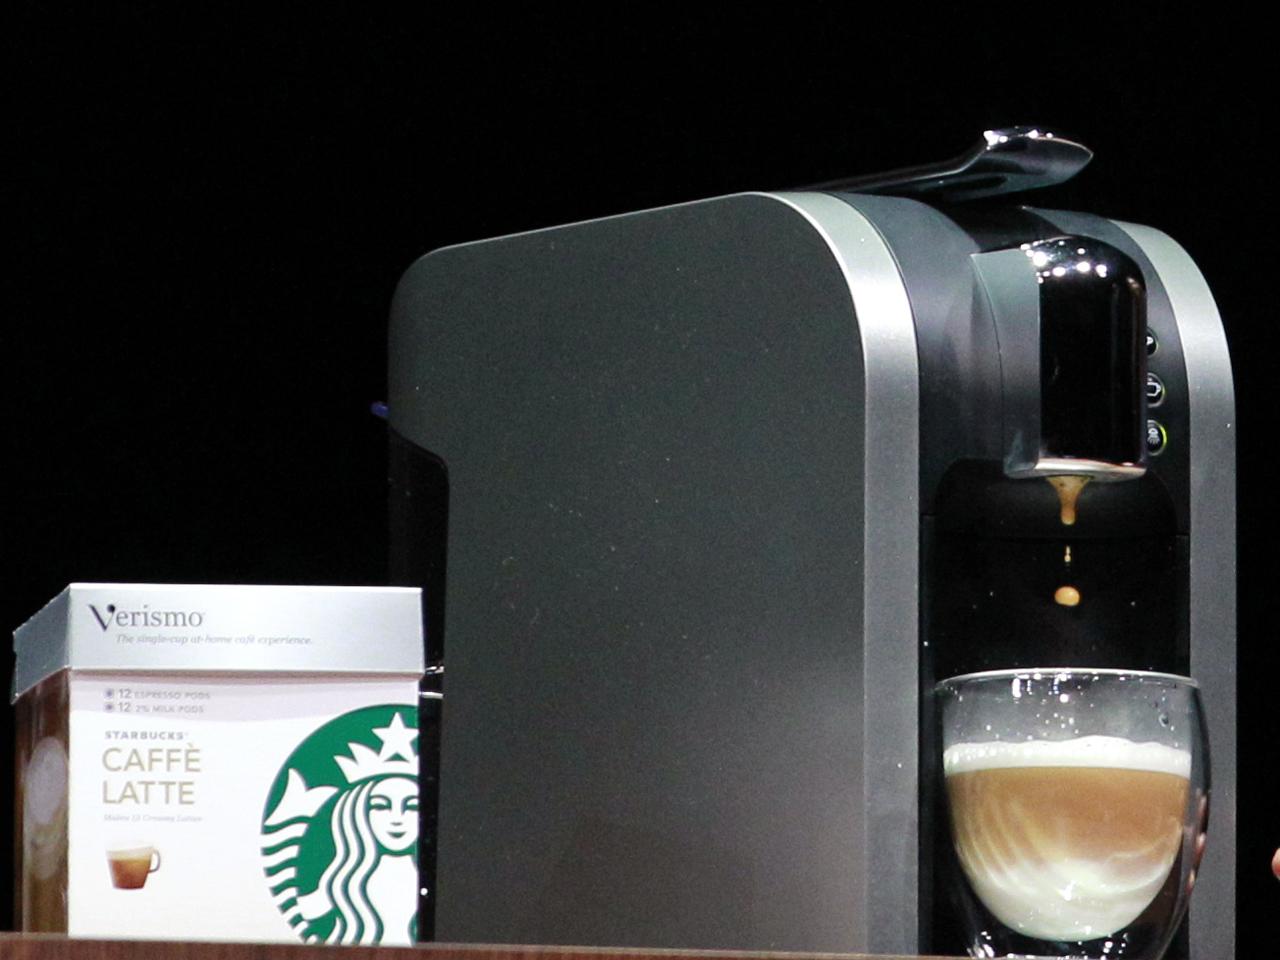 Verismo Coffee Maker Not Working : Starbucks three-way